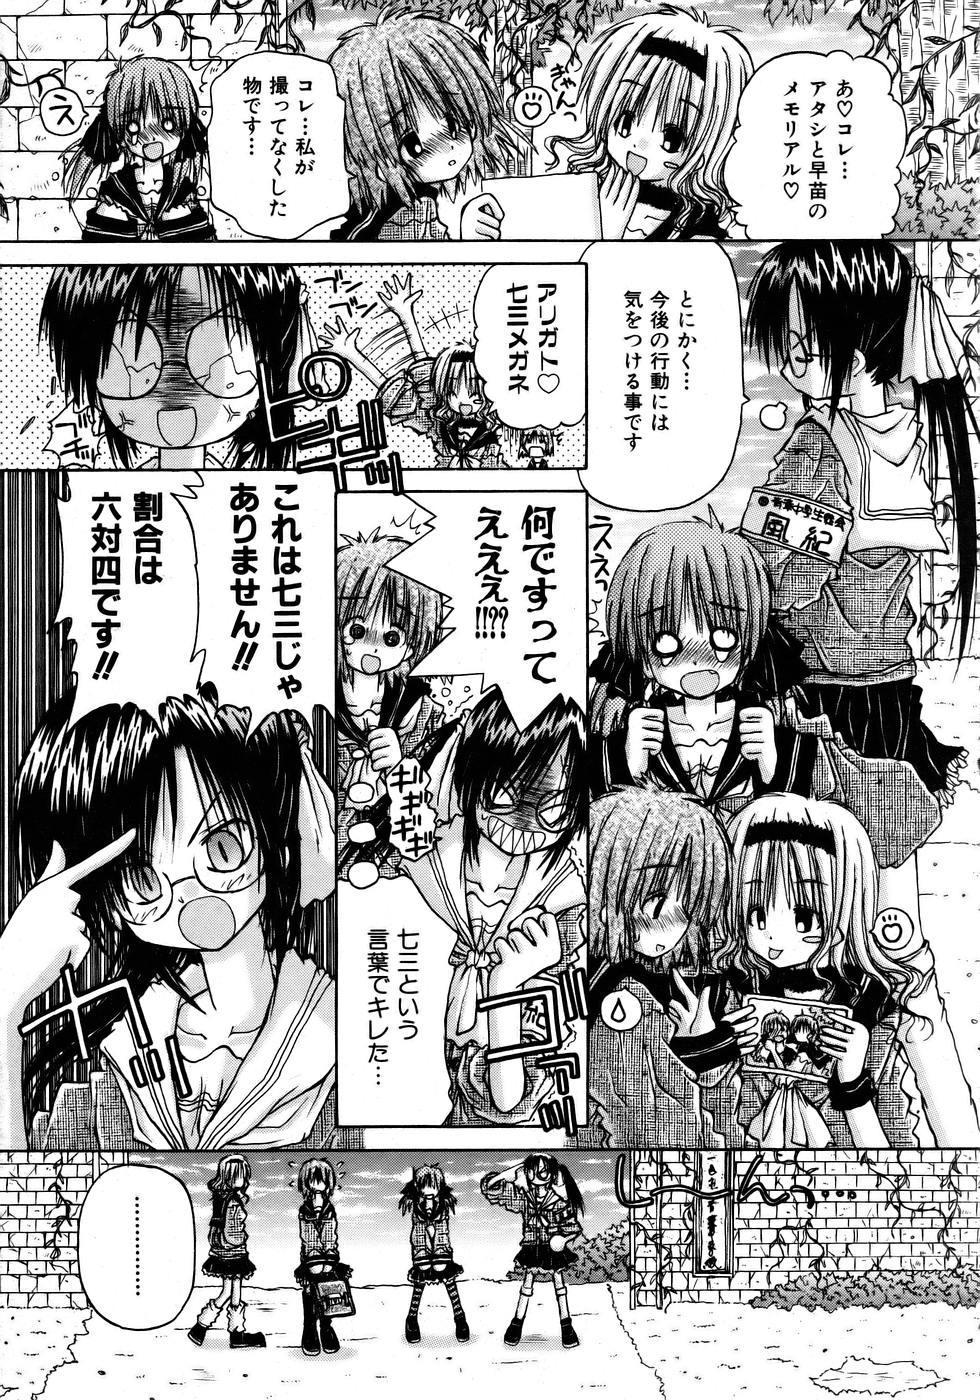 COMIC AUN 2005-12 Vol. 115 370